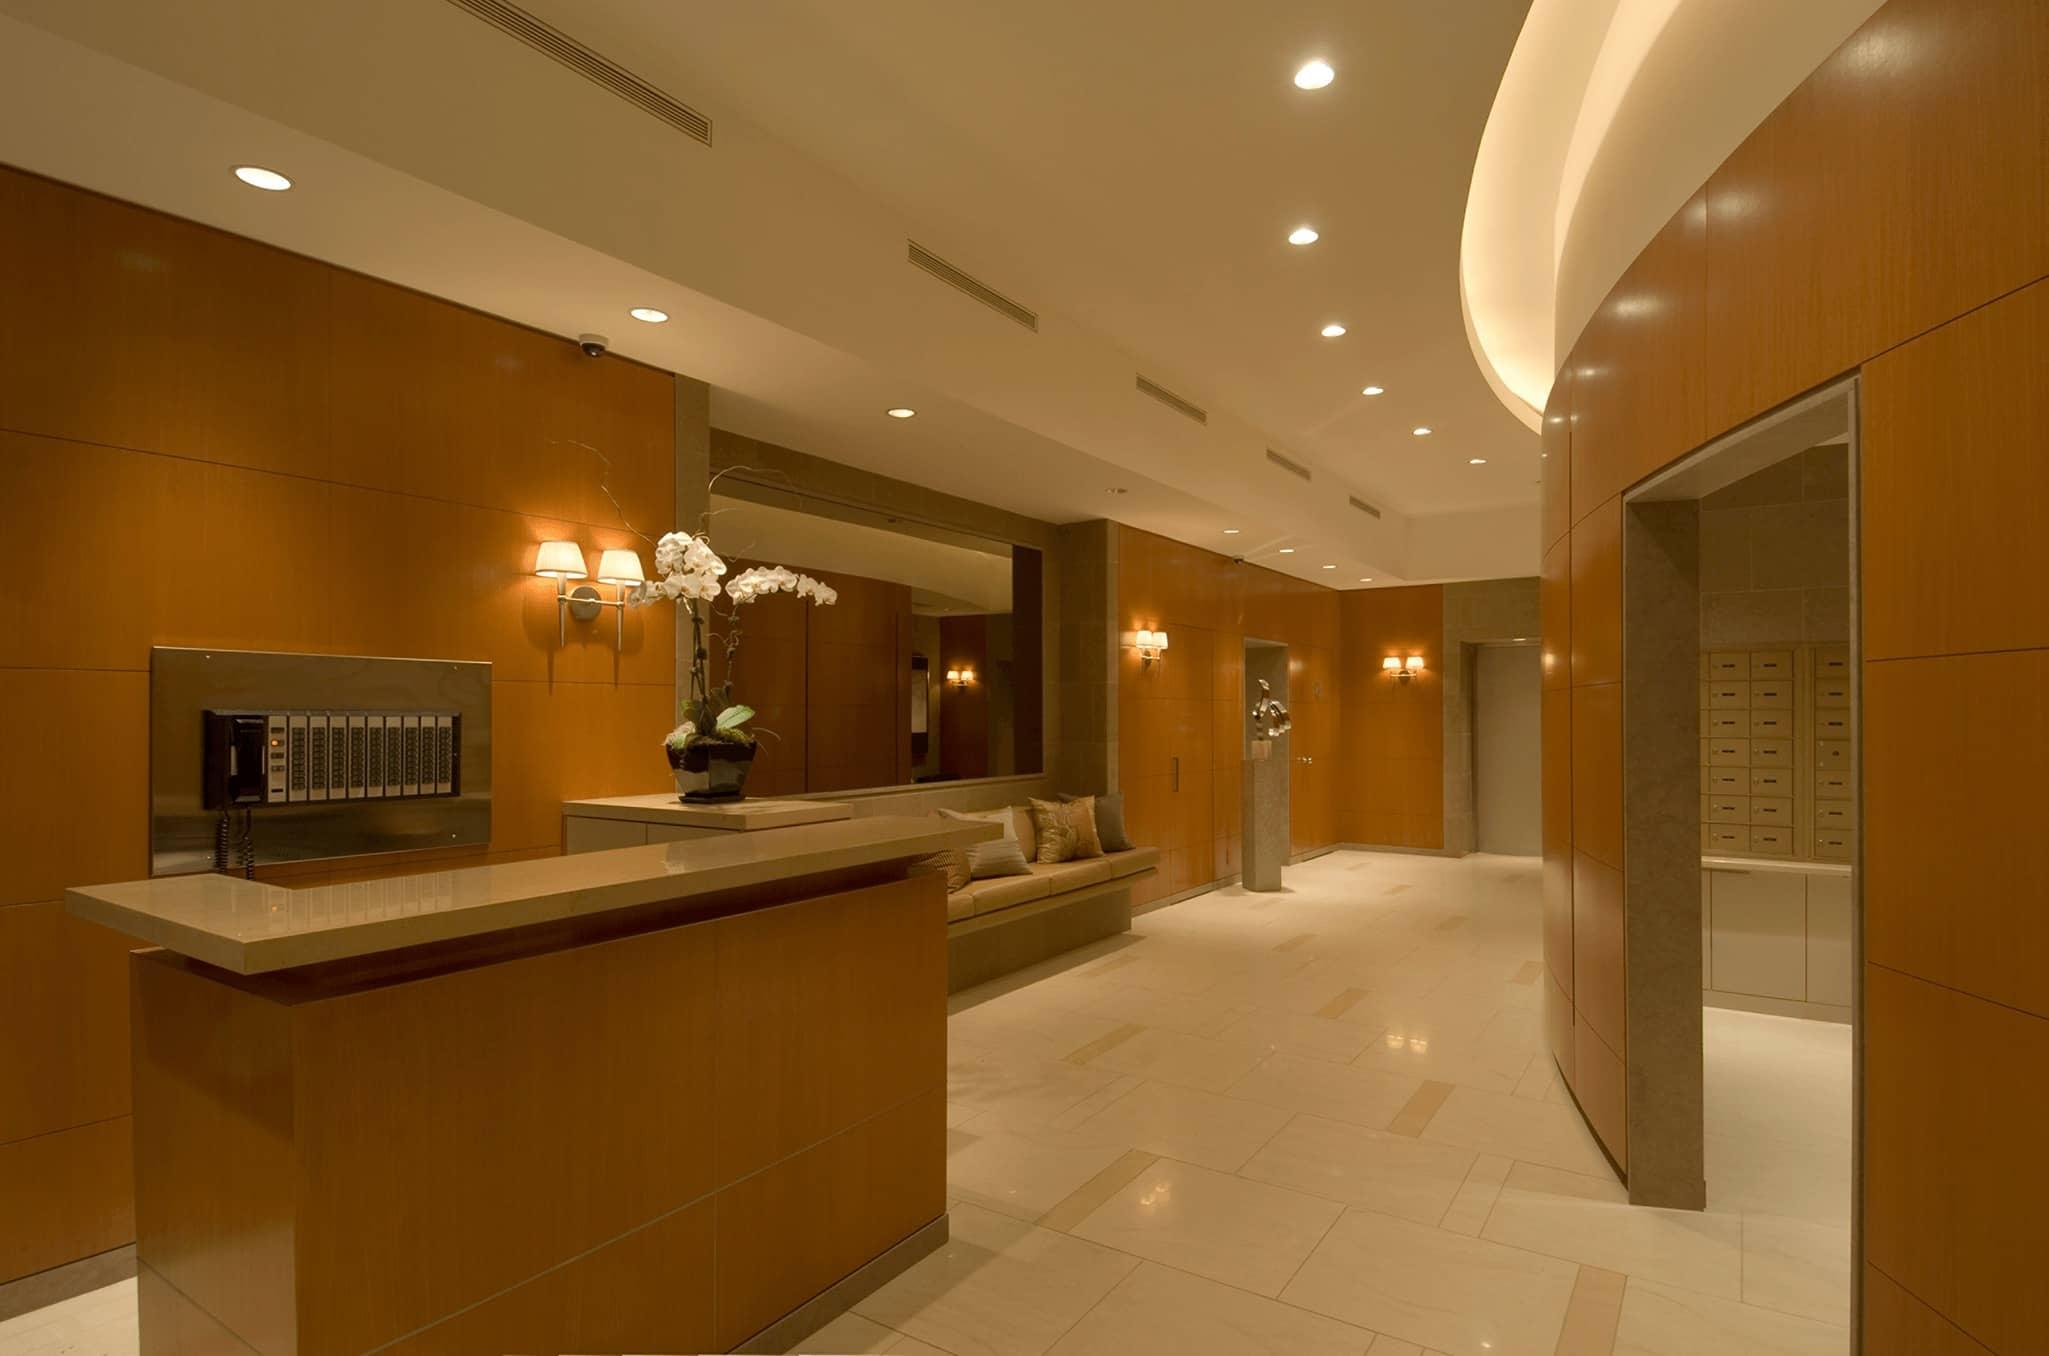 Modern lobby at 301 East 63rd Street.